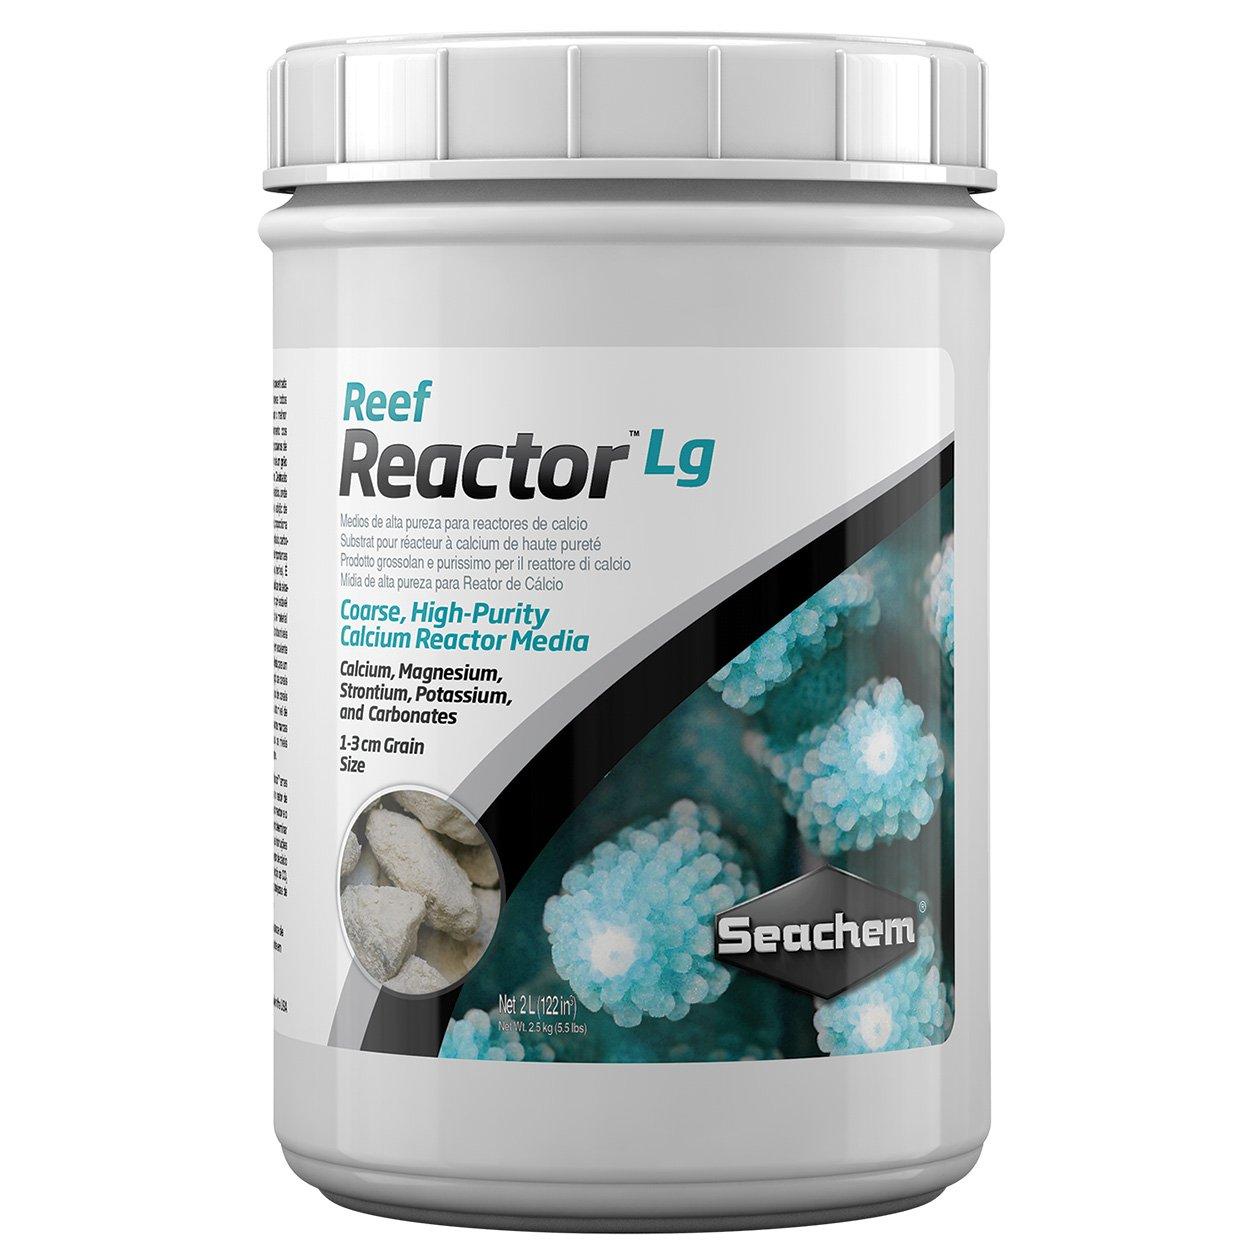 Seachem Reef Reactor Lg for Saltwater 2L